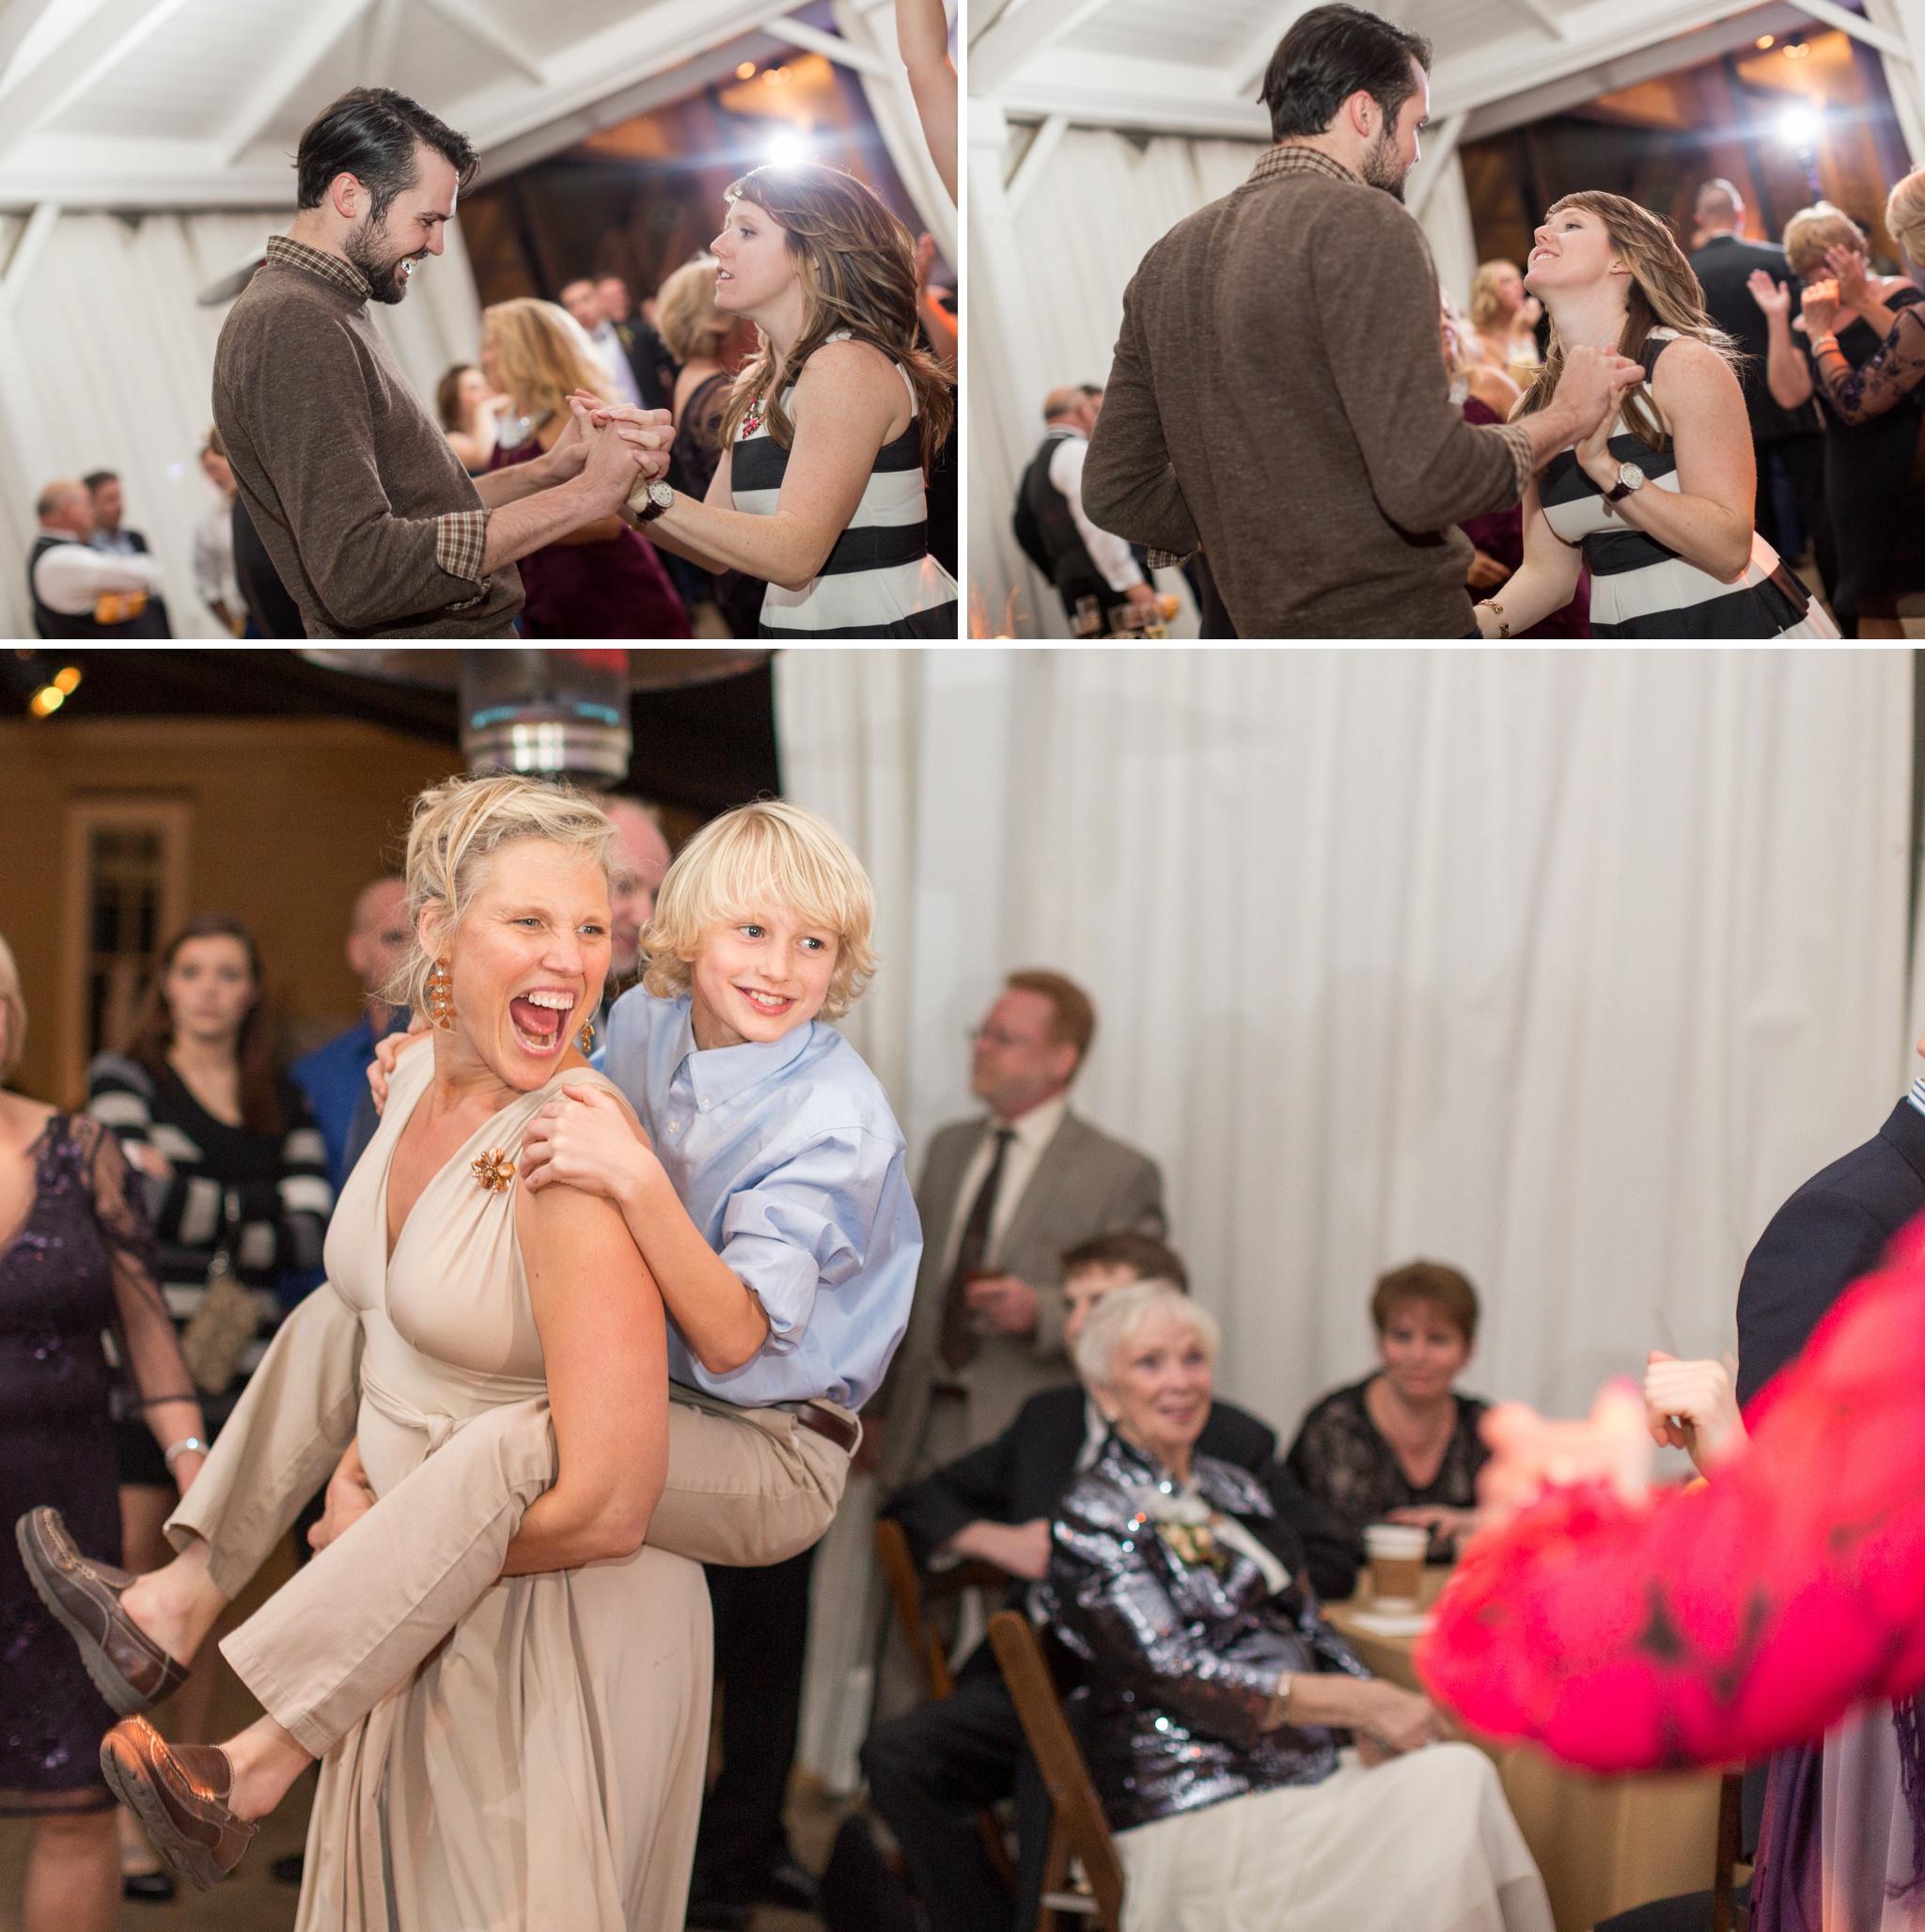 wedding-dance-floor-nashville